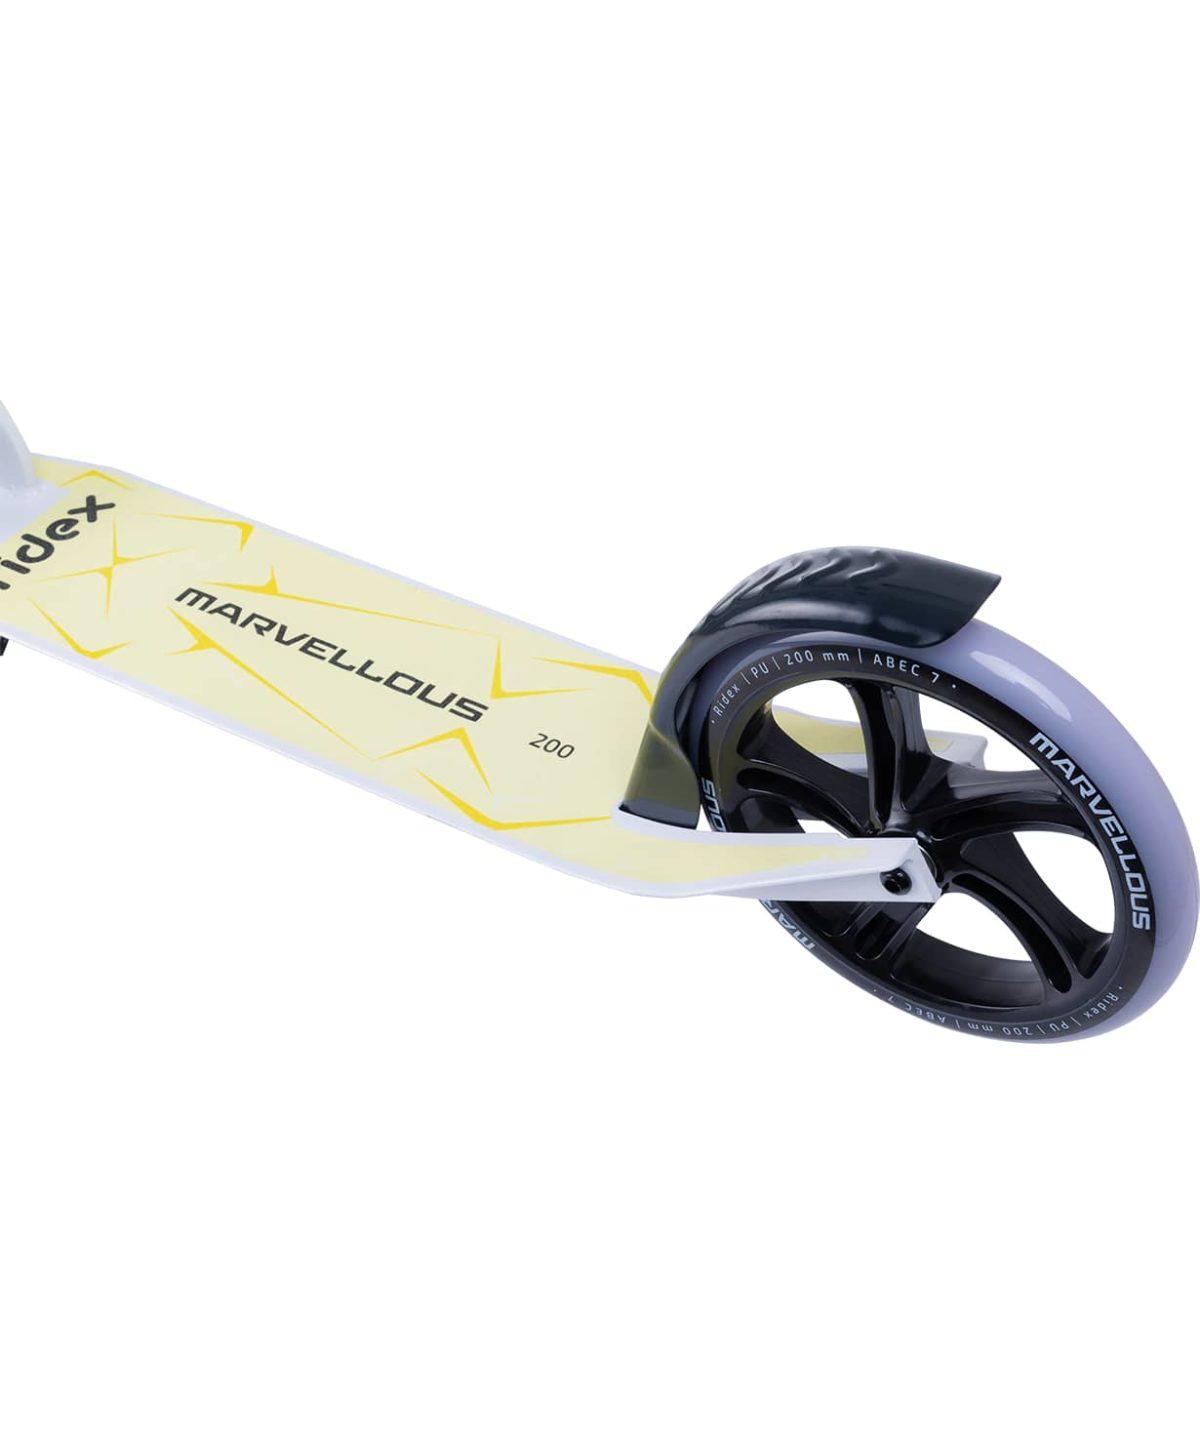 RIDEX Marvellous Самокат 2-х колес. 200 мм  Marvellous: белый/жёлтый - 3